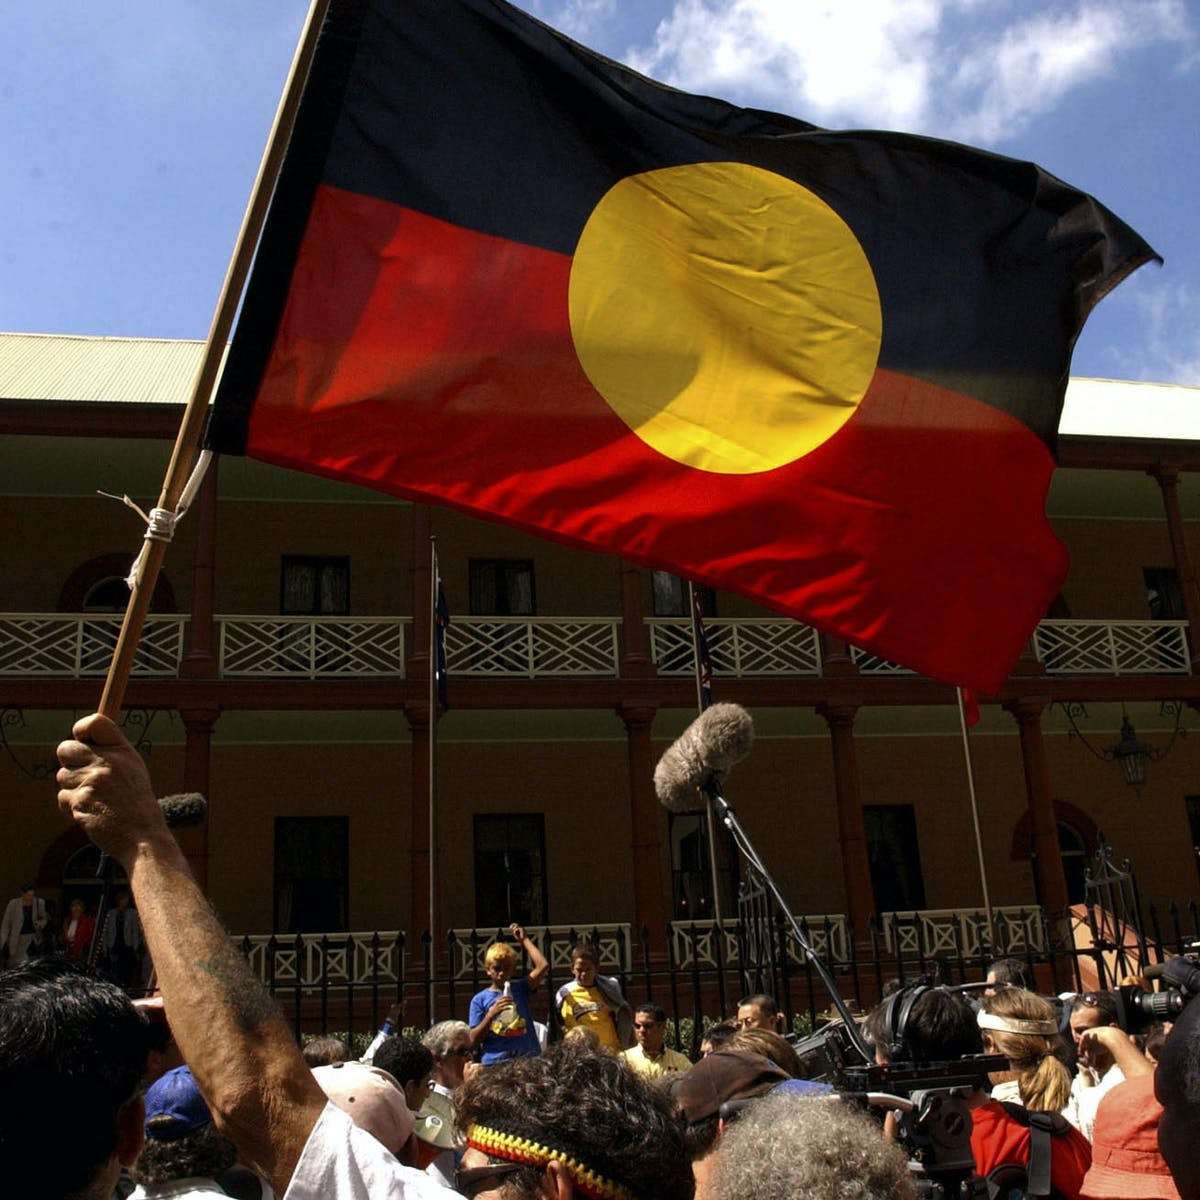 As Indigenous incarceration rates keep rising, justice